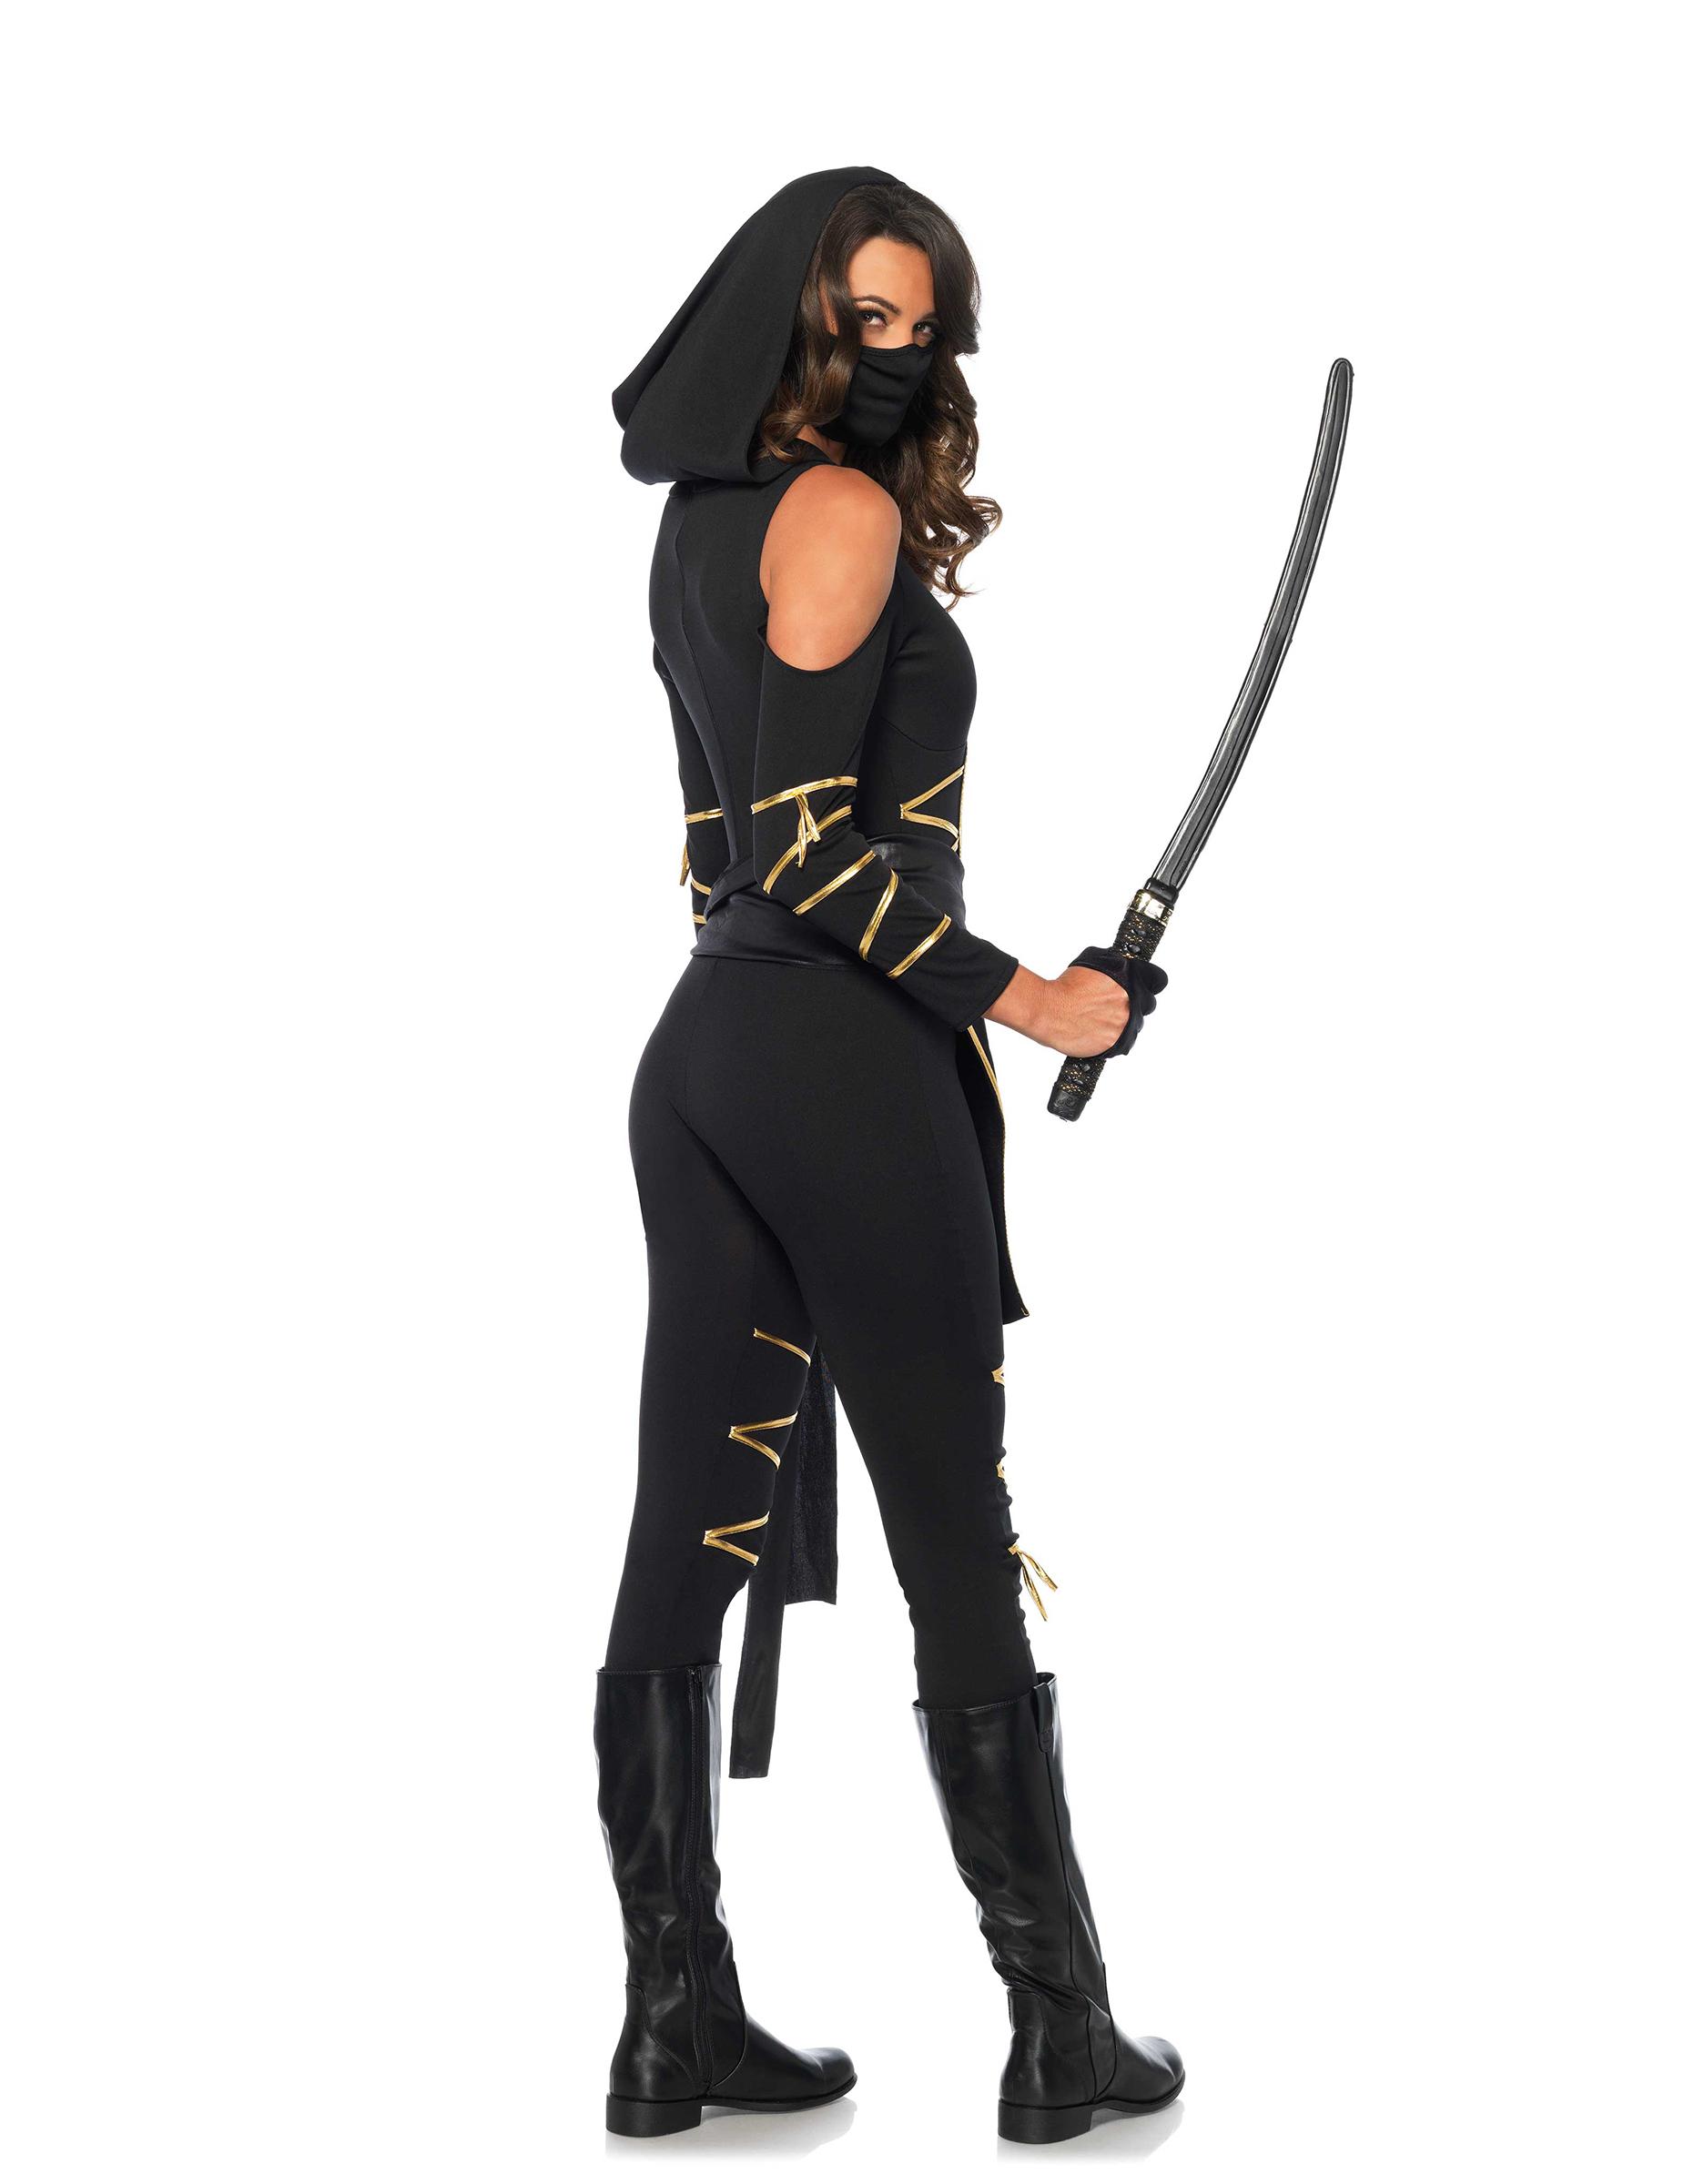 1adc31c1b8fb3 Déguisement ninja dragon d or femme   Deguise-toi